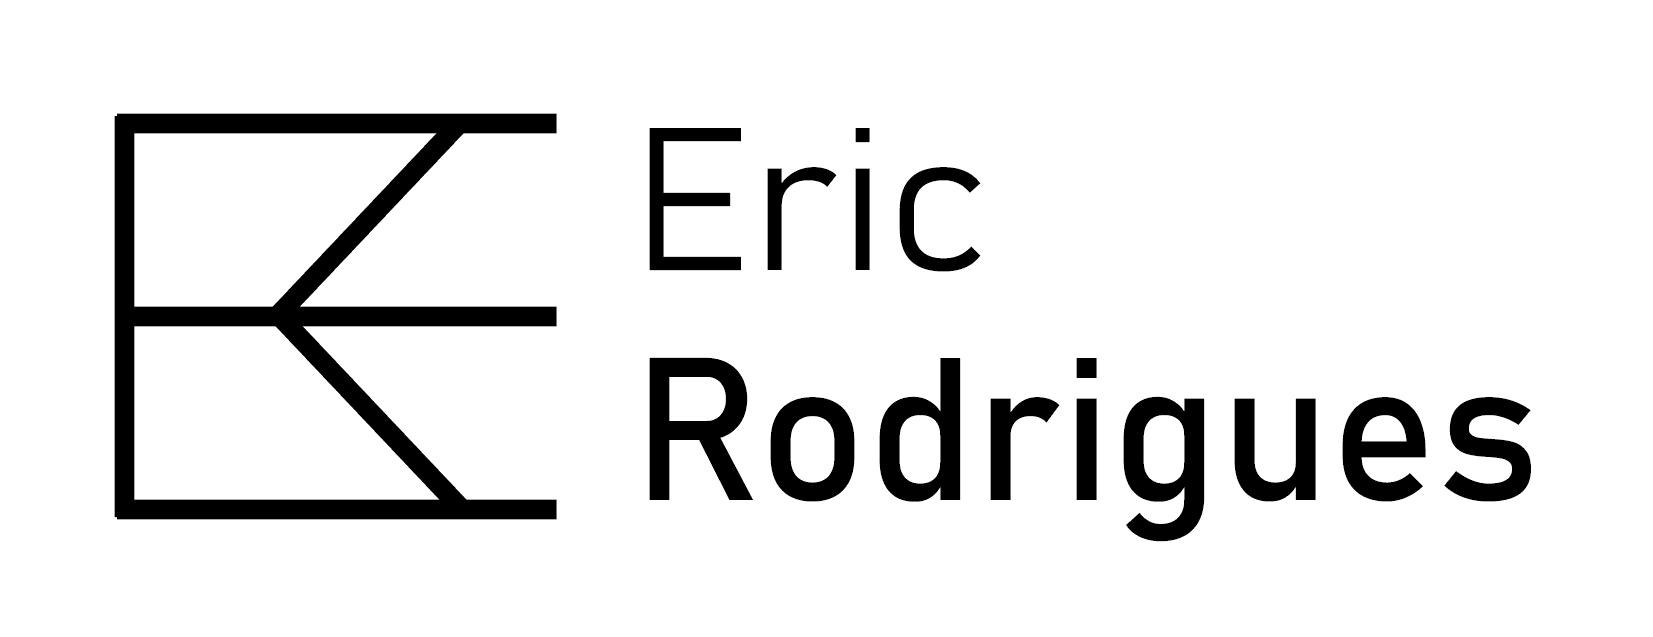 Eric Rodrigues